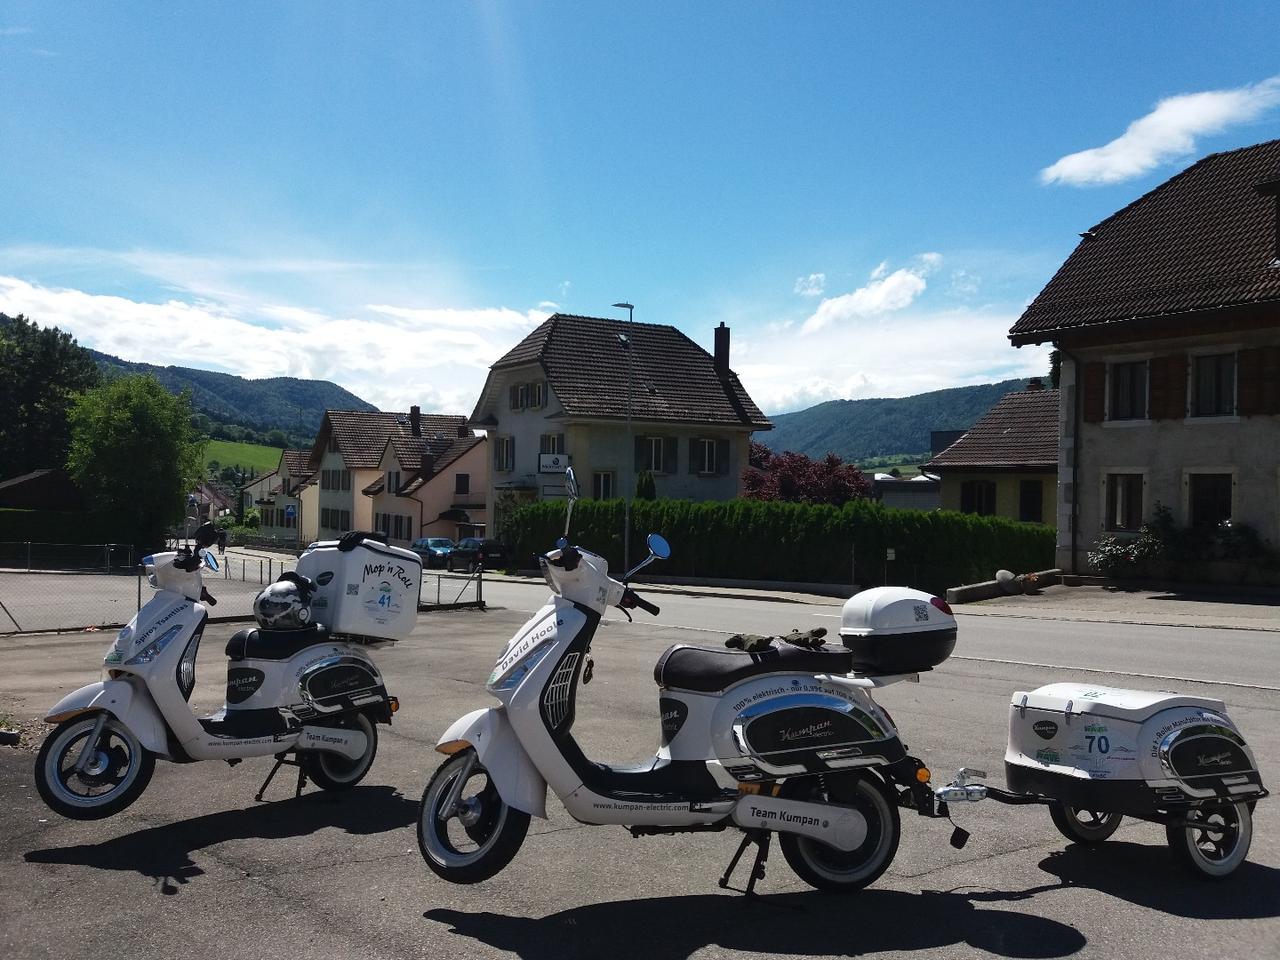 A last rest stop for Team Kumpana few miles before the WAVE Trophy finish line in Pratteln, Switzerland